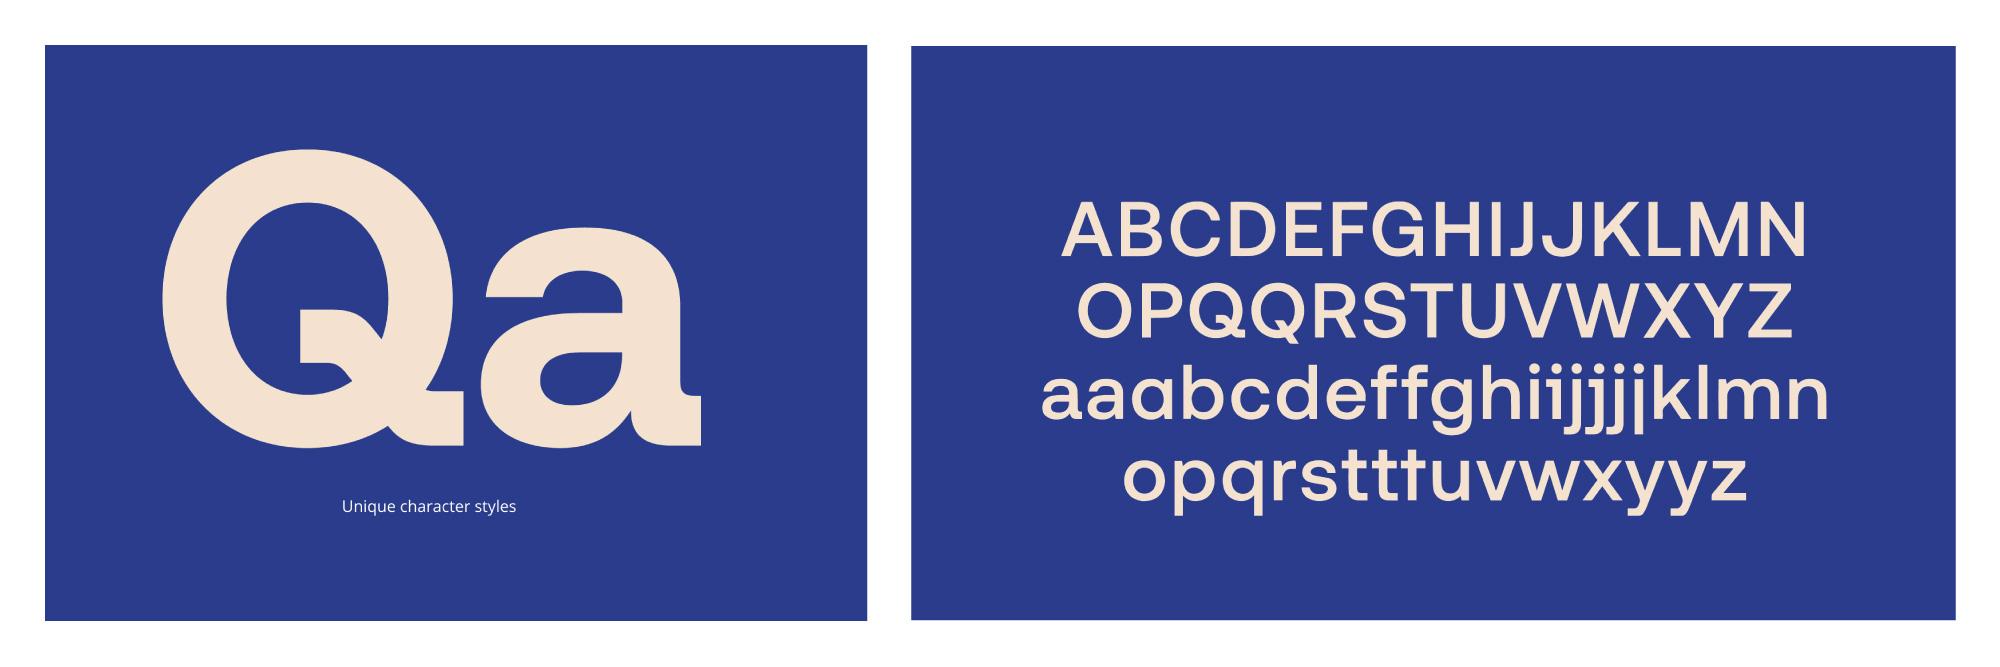 cj-affiliate-2021-brand-refresh-typeface-FINAL